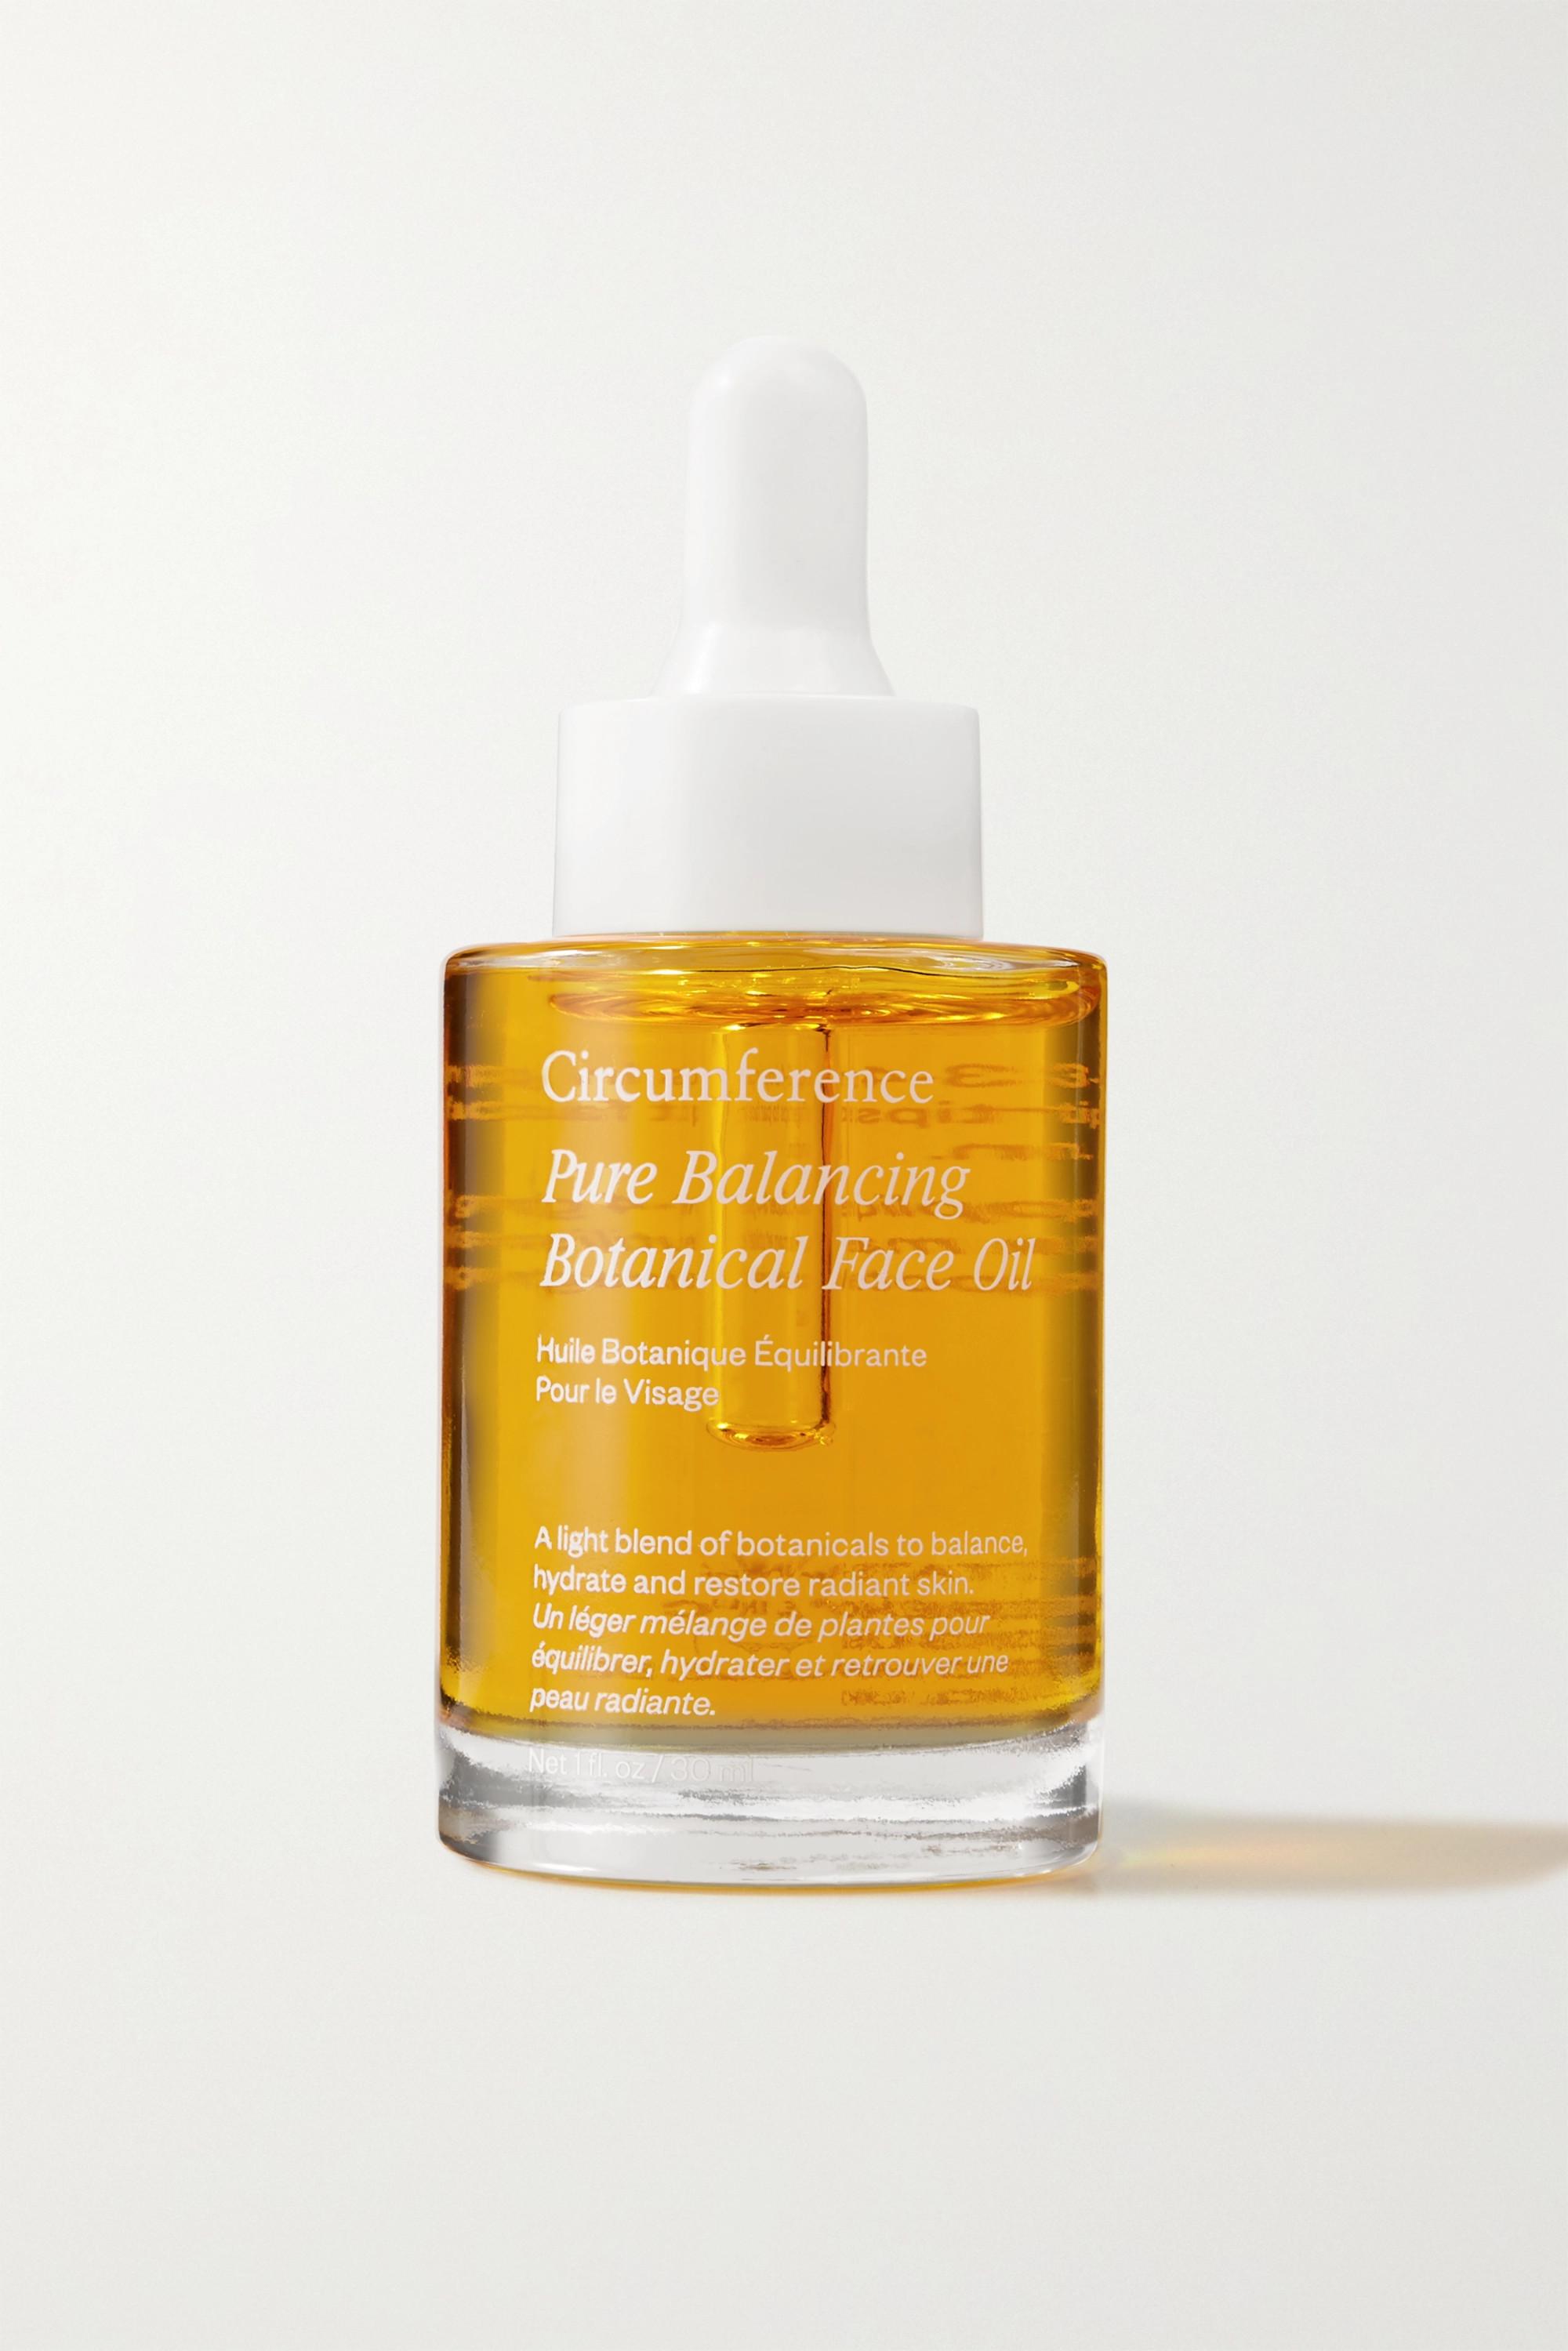 Circumference Pure Balancing Botanical Face Oil, 30ml